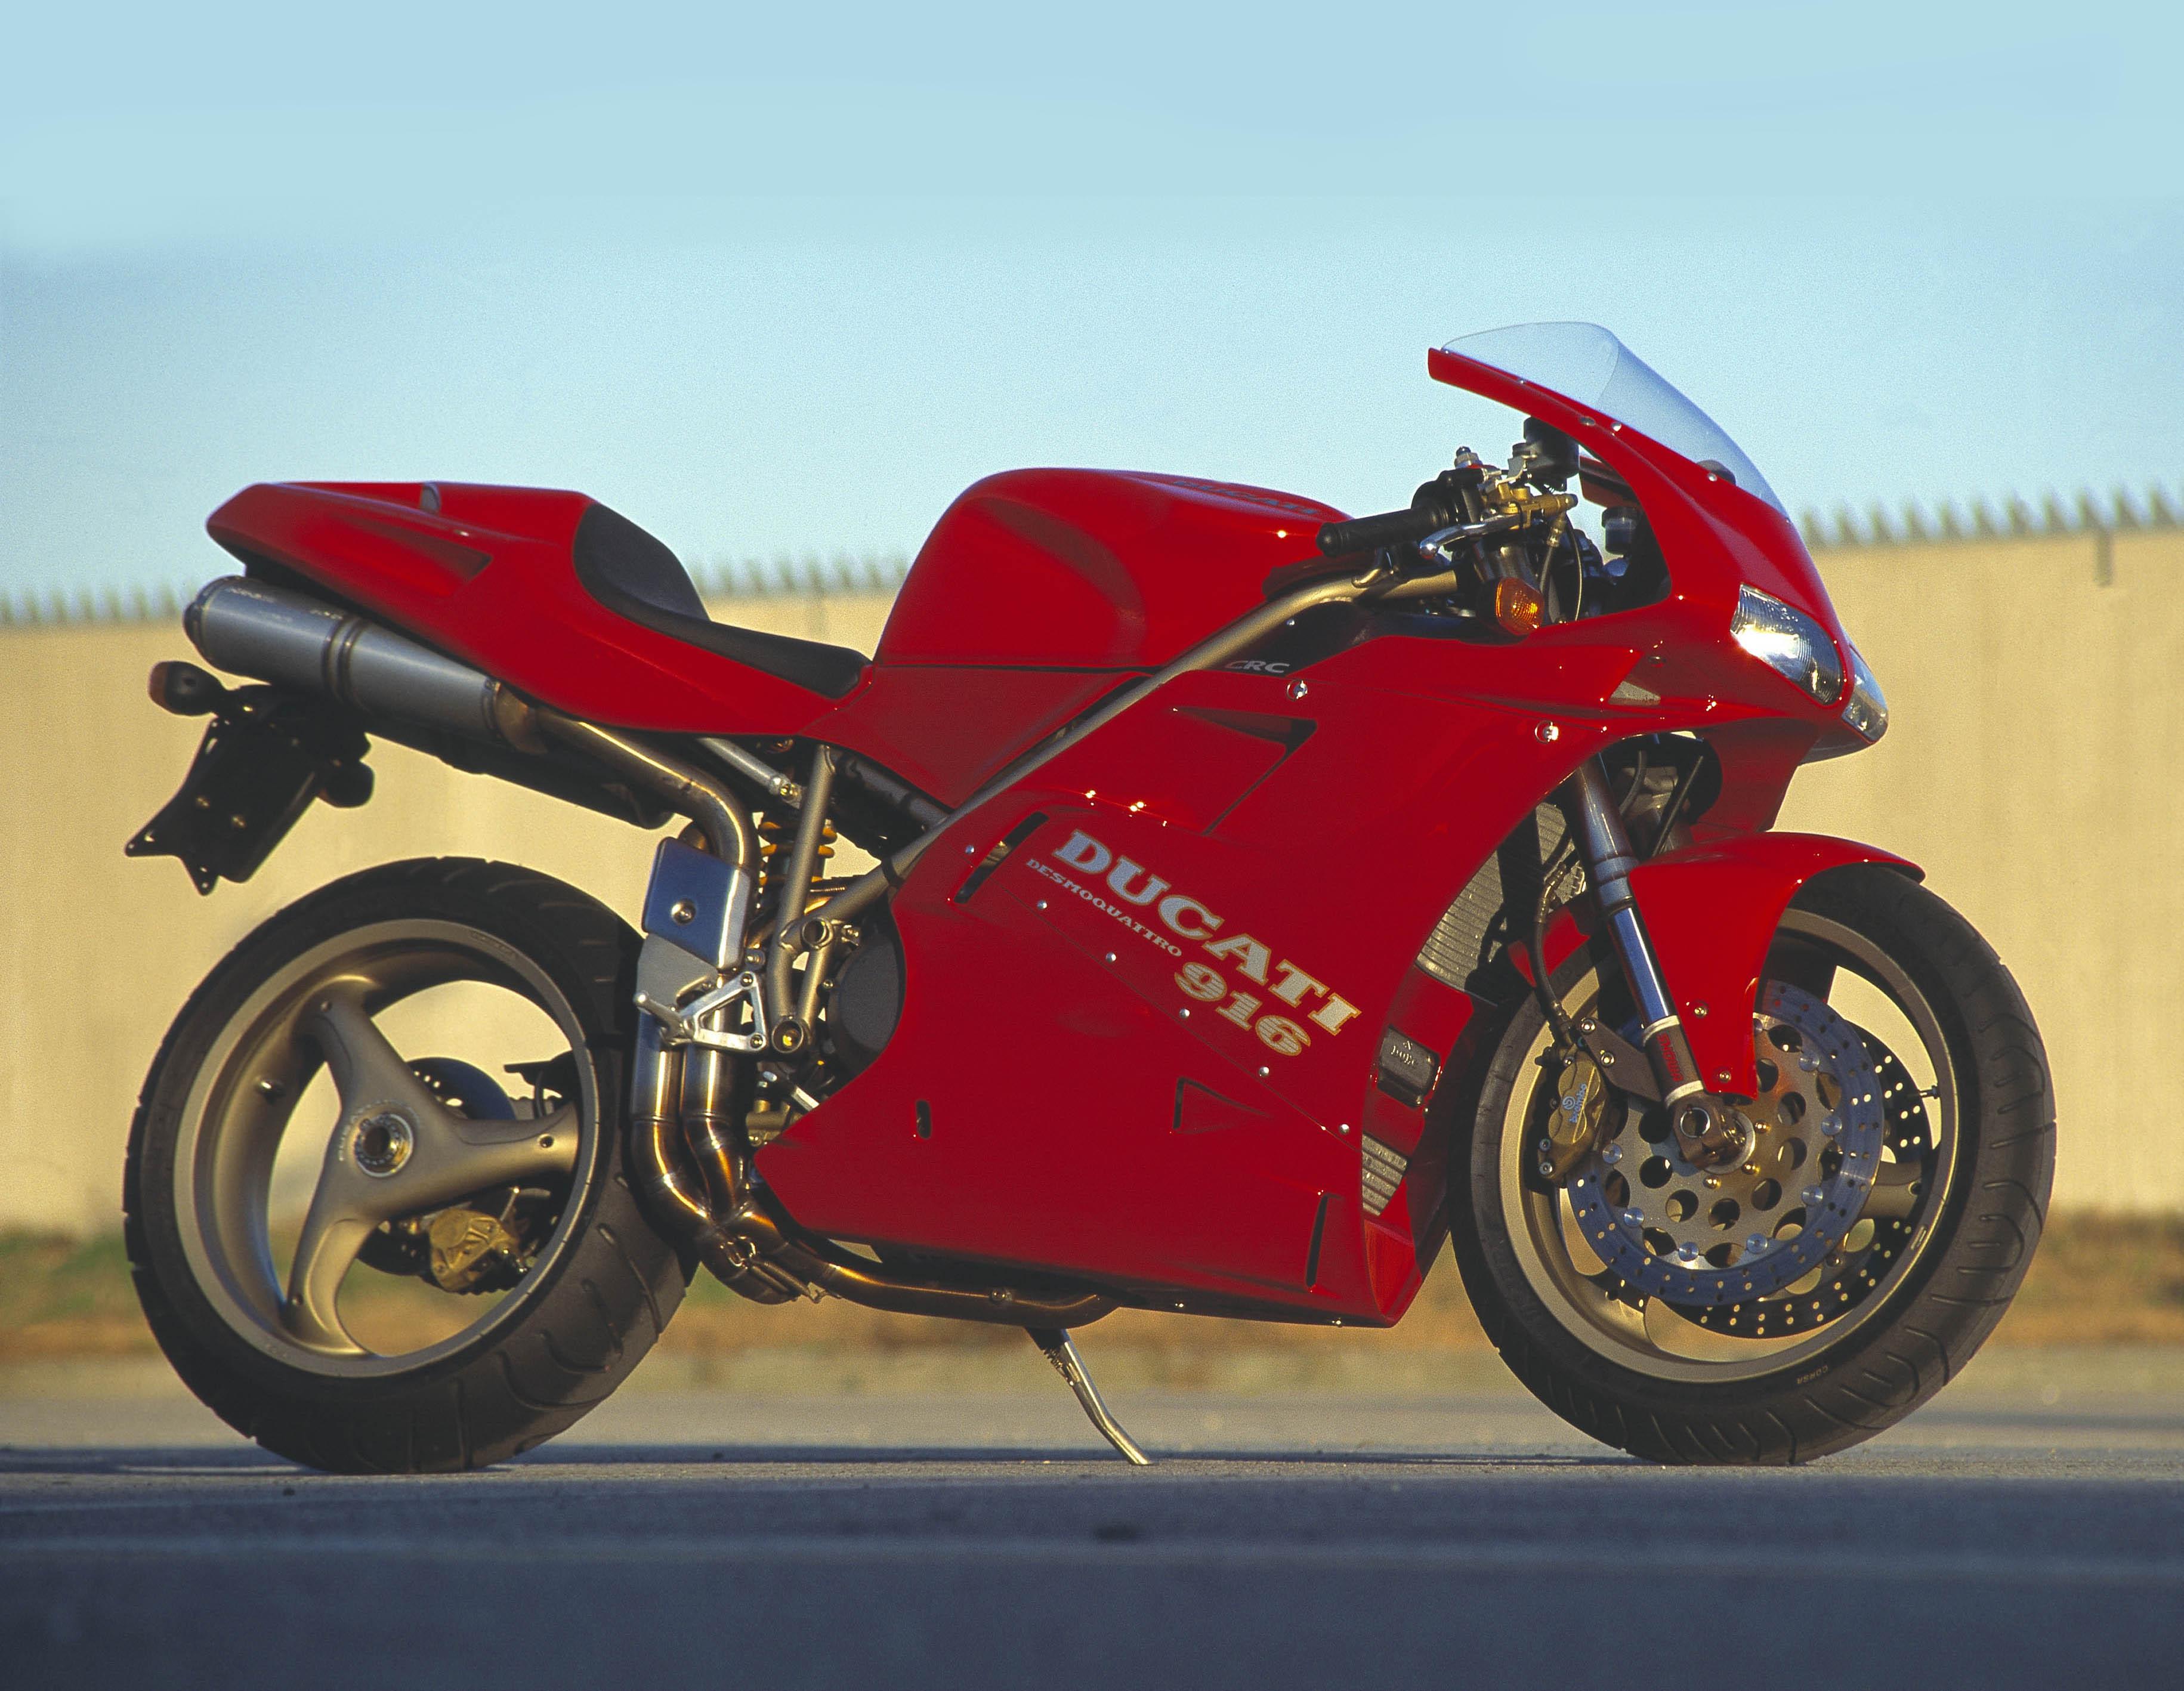 ducati 916 the bike the legend visordown. Black Bedroom Furniture Sets. Home Design Ideas